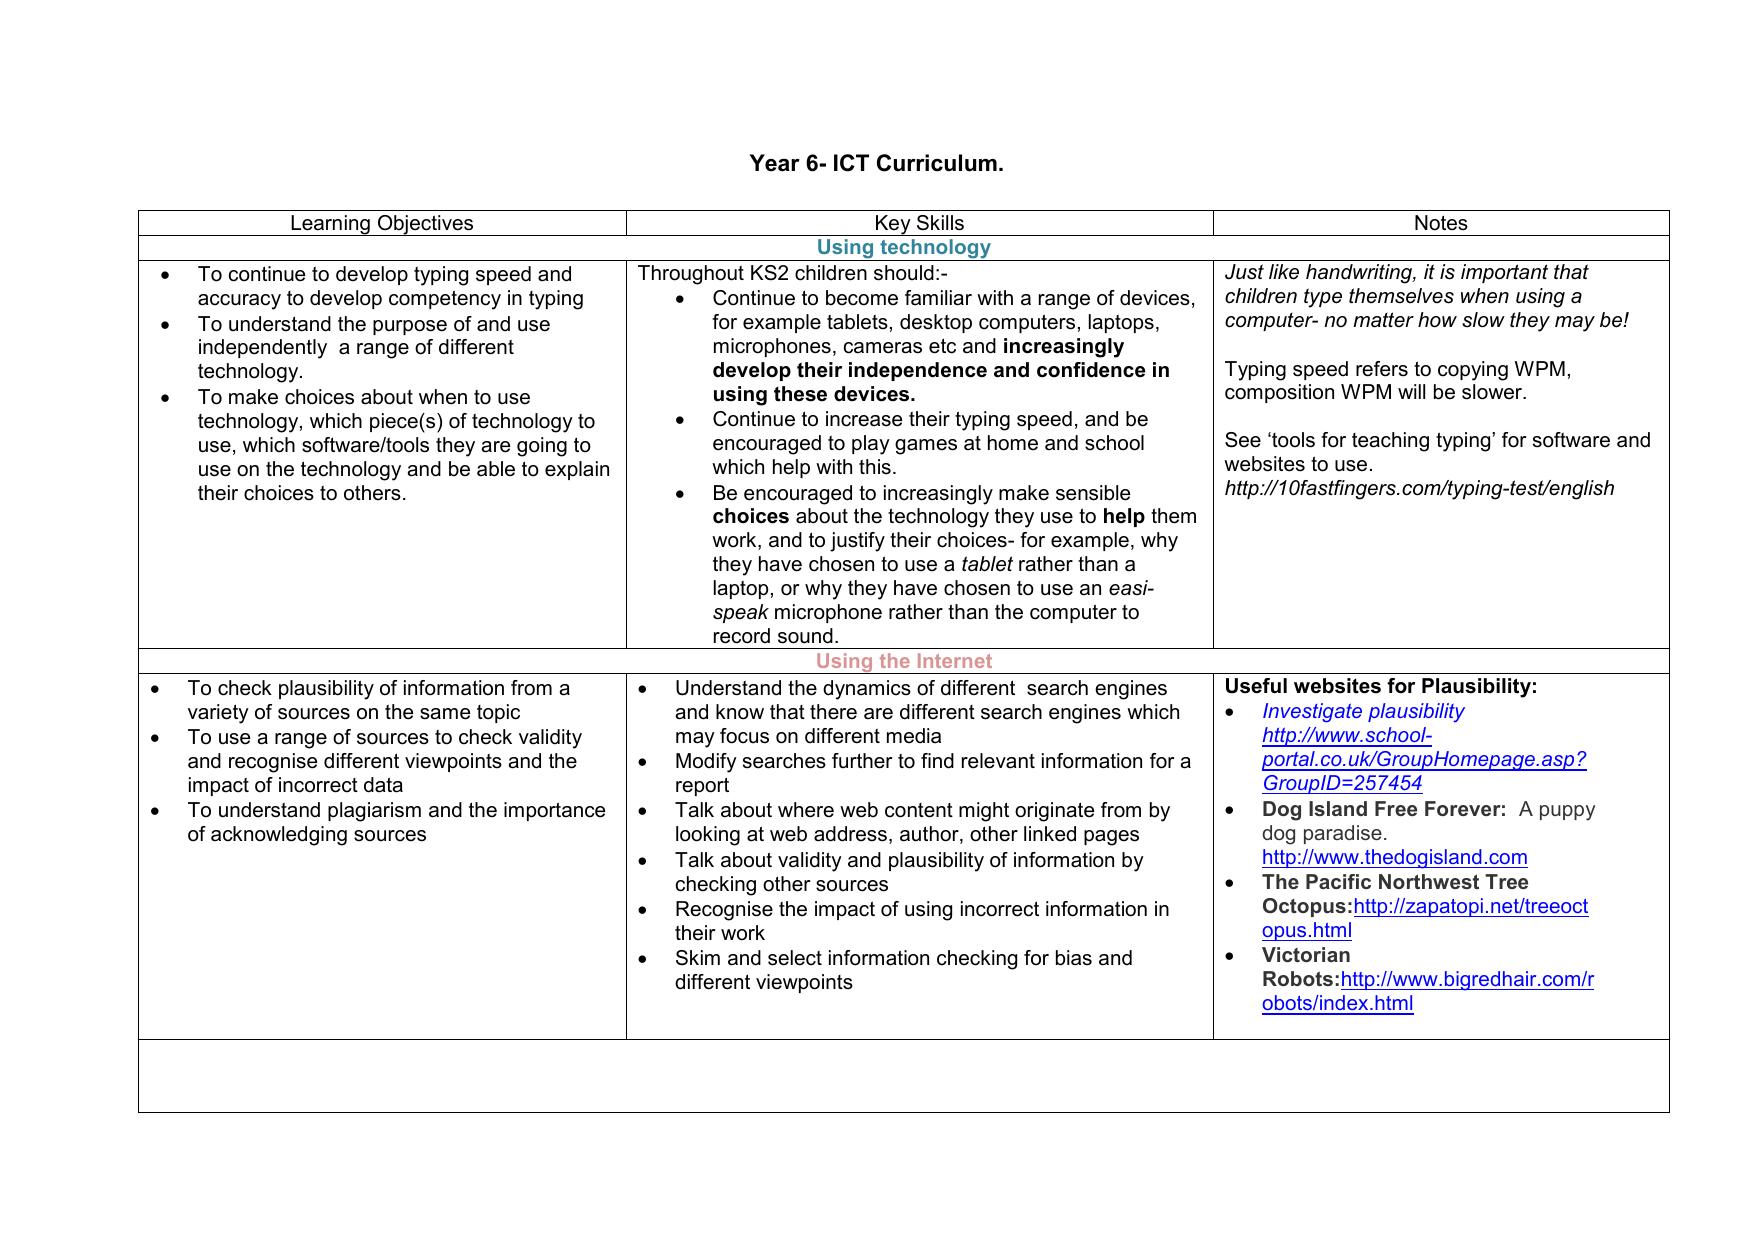 Year 6- ICT Curriculum  - West Earlham Junior School